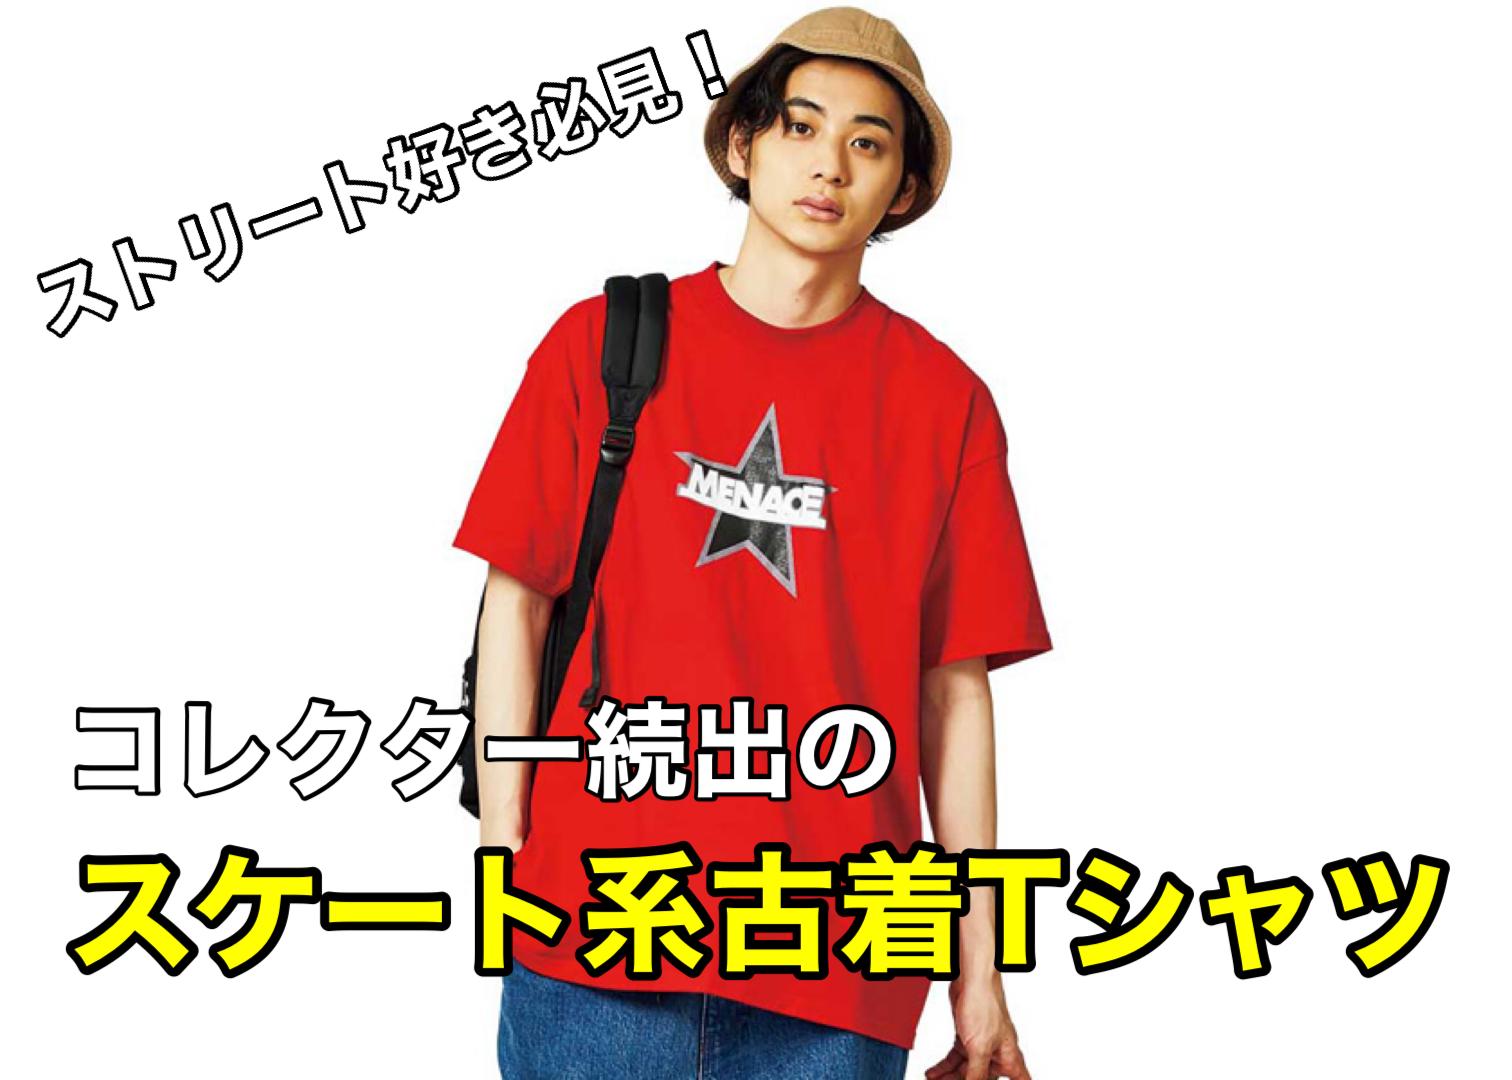 https://cdn.fineboys-online.jp/thegear/content/theme/img/org/article/3550/main.jpg?t=1629114502